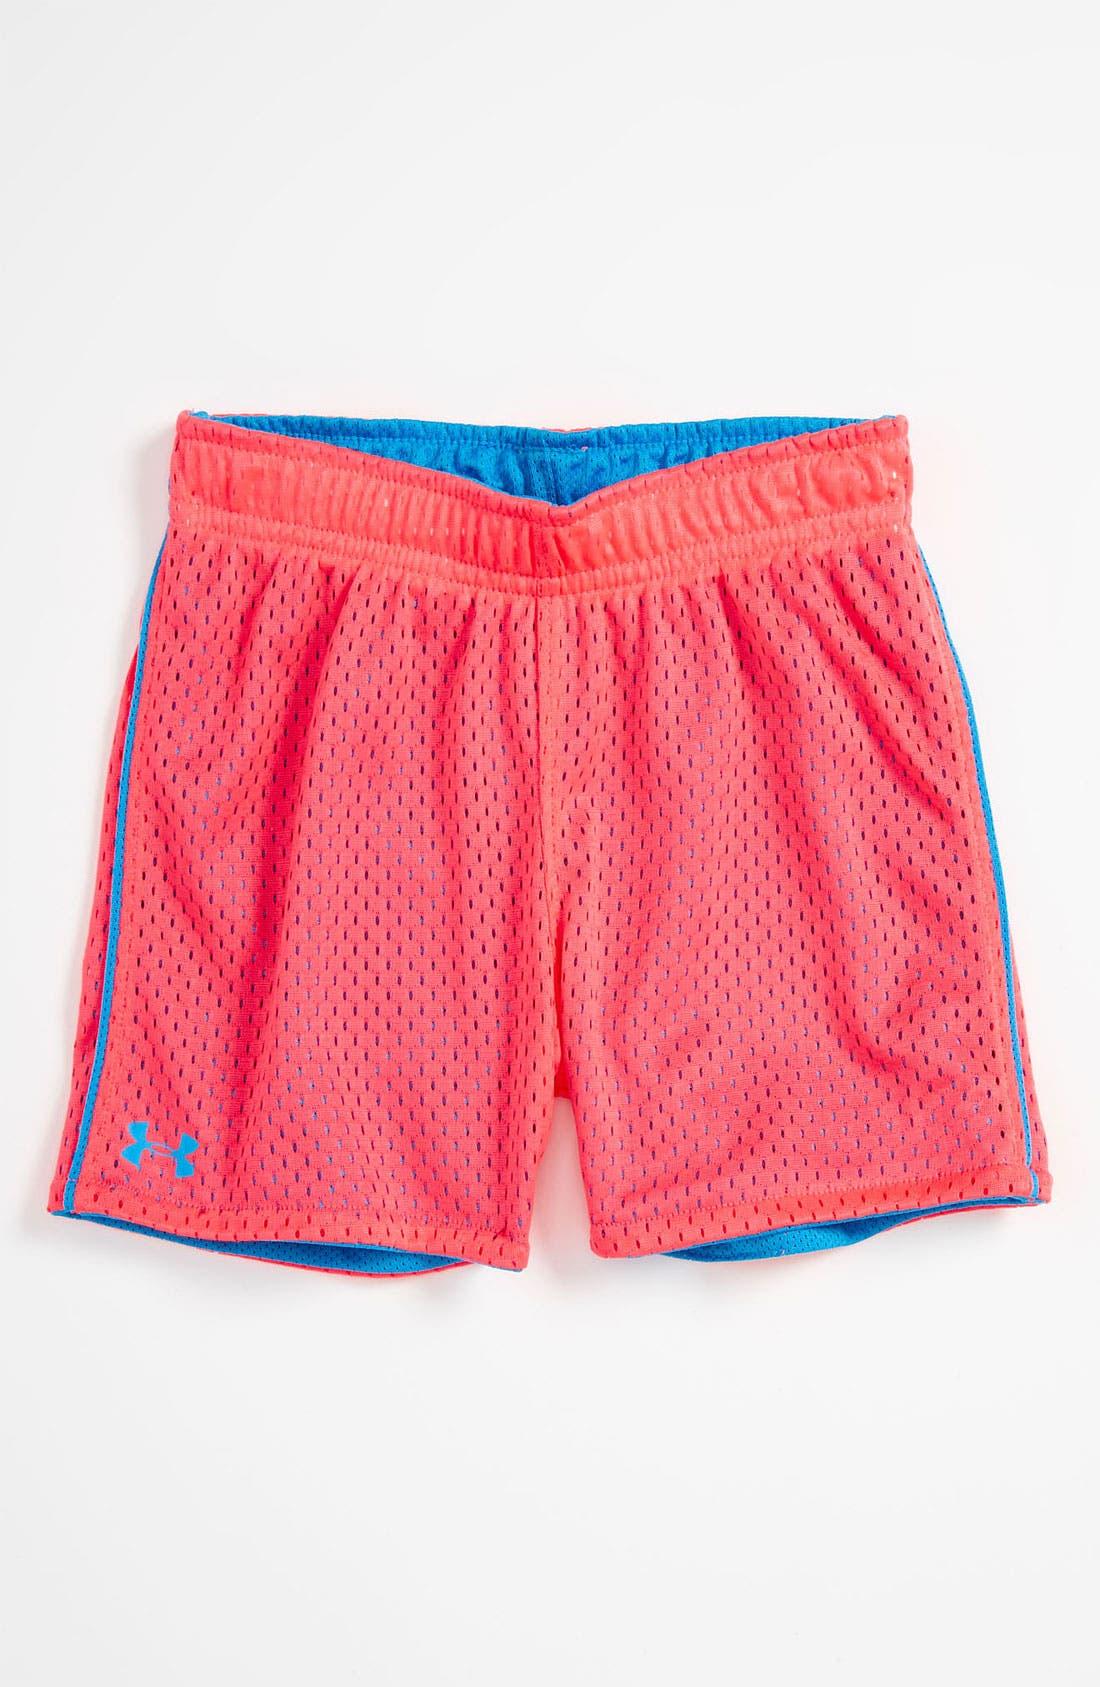 Main Image - Under Armour Reversible Shorts (Toddler)